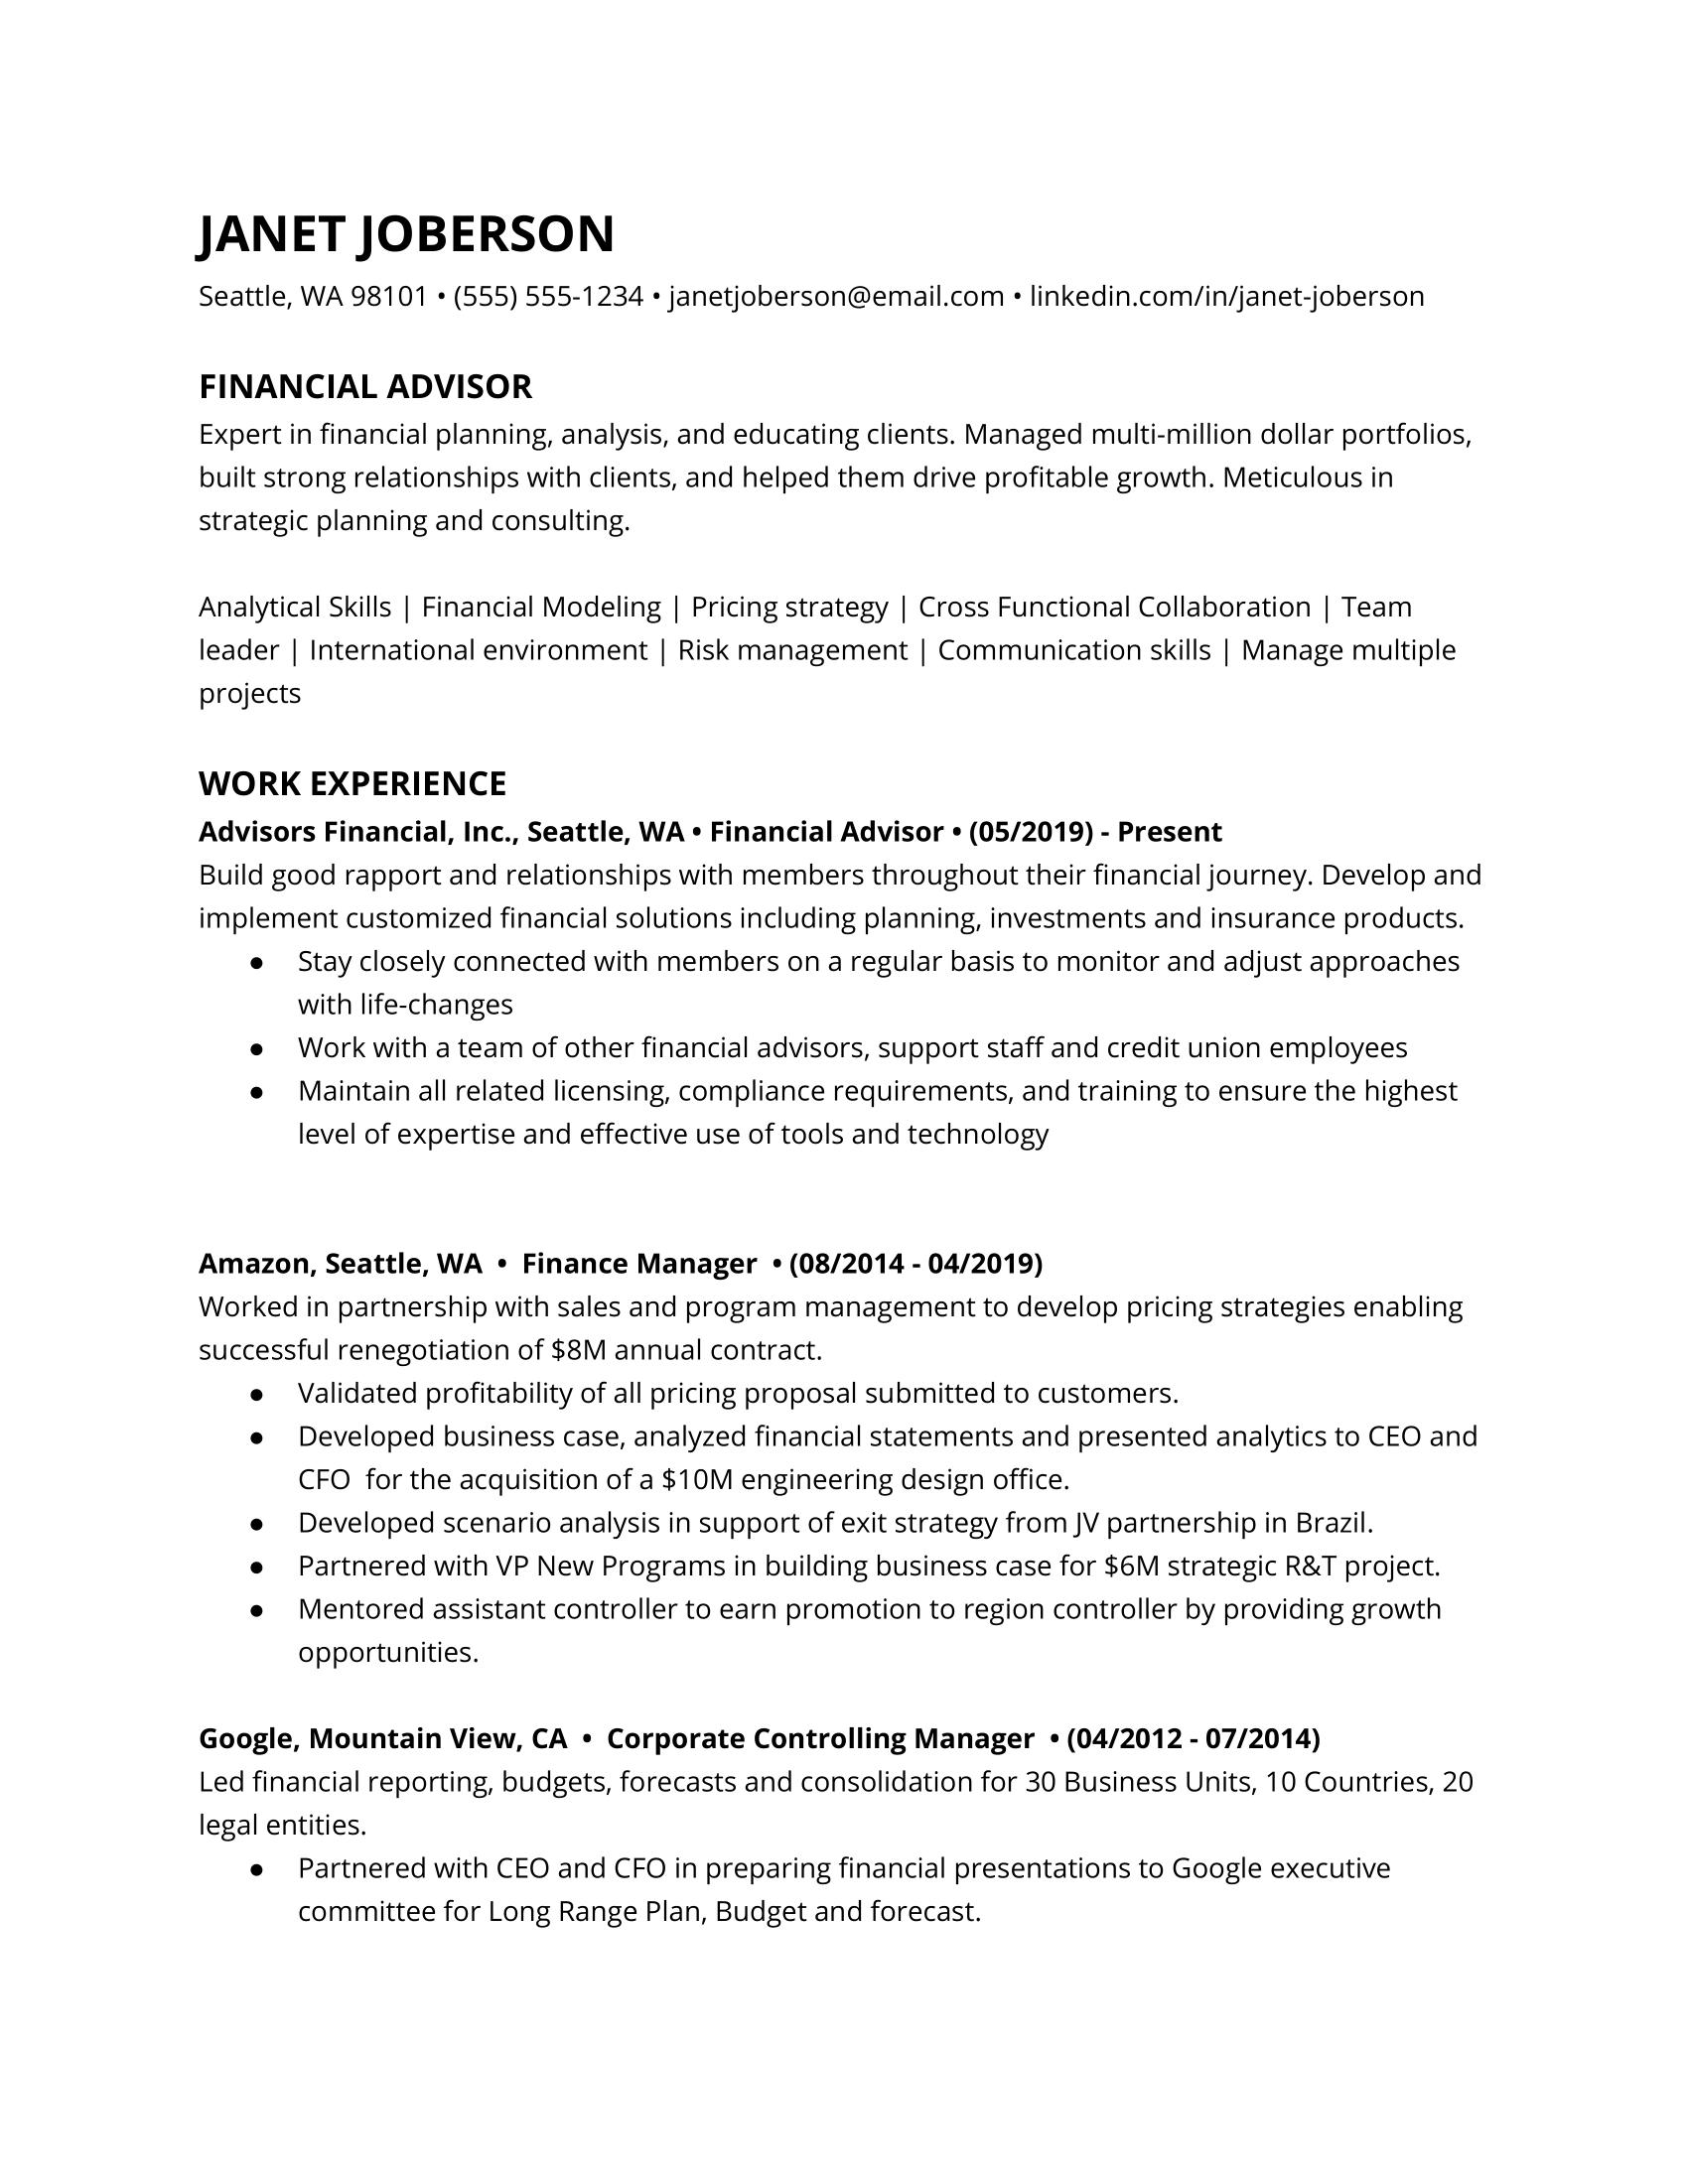 Financial Advisor Resume Example 3